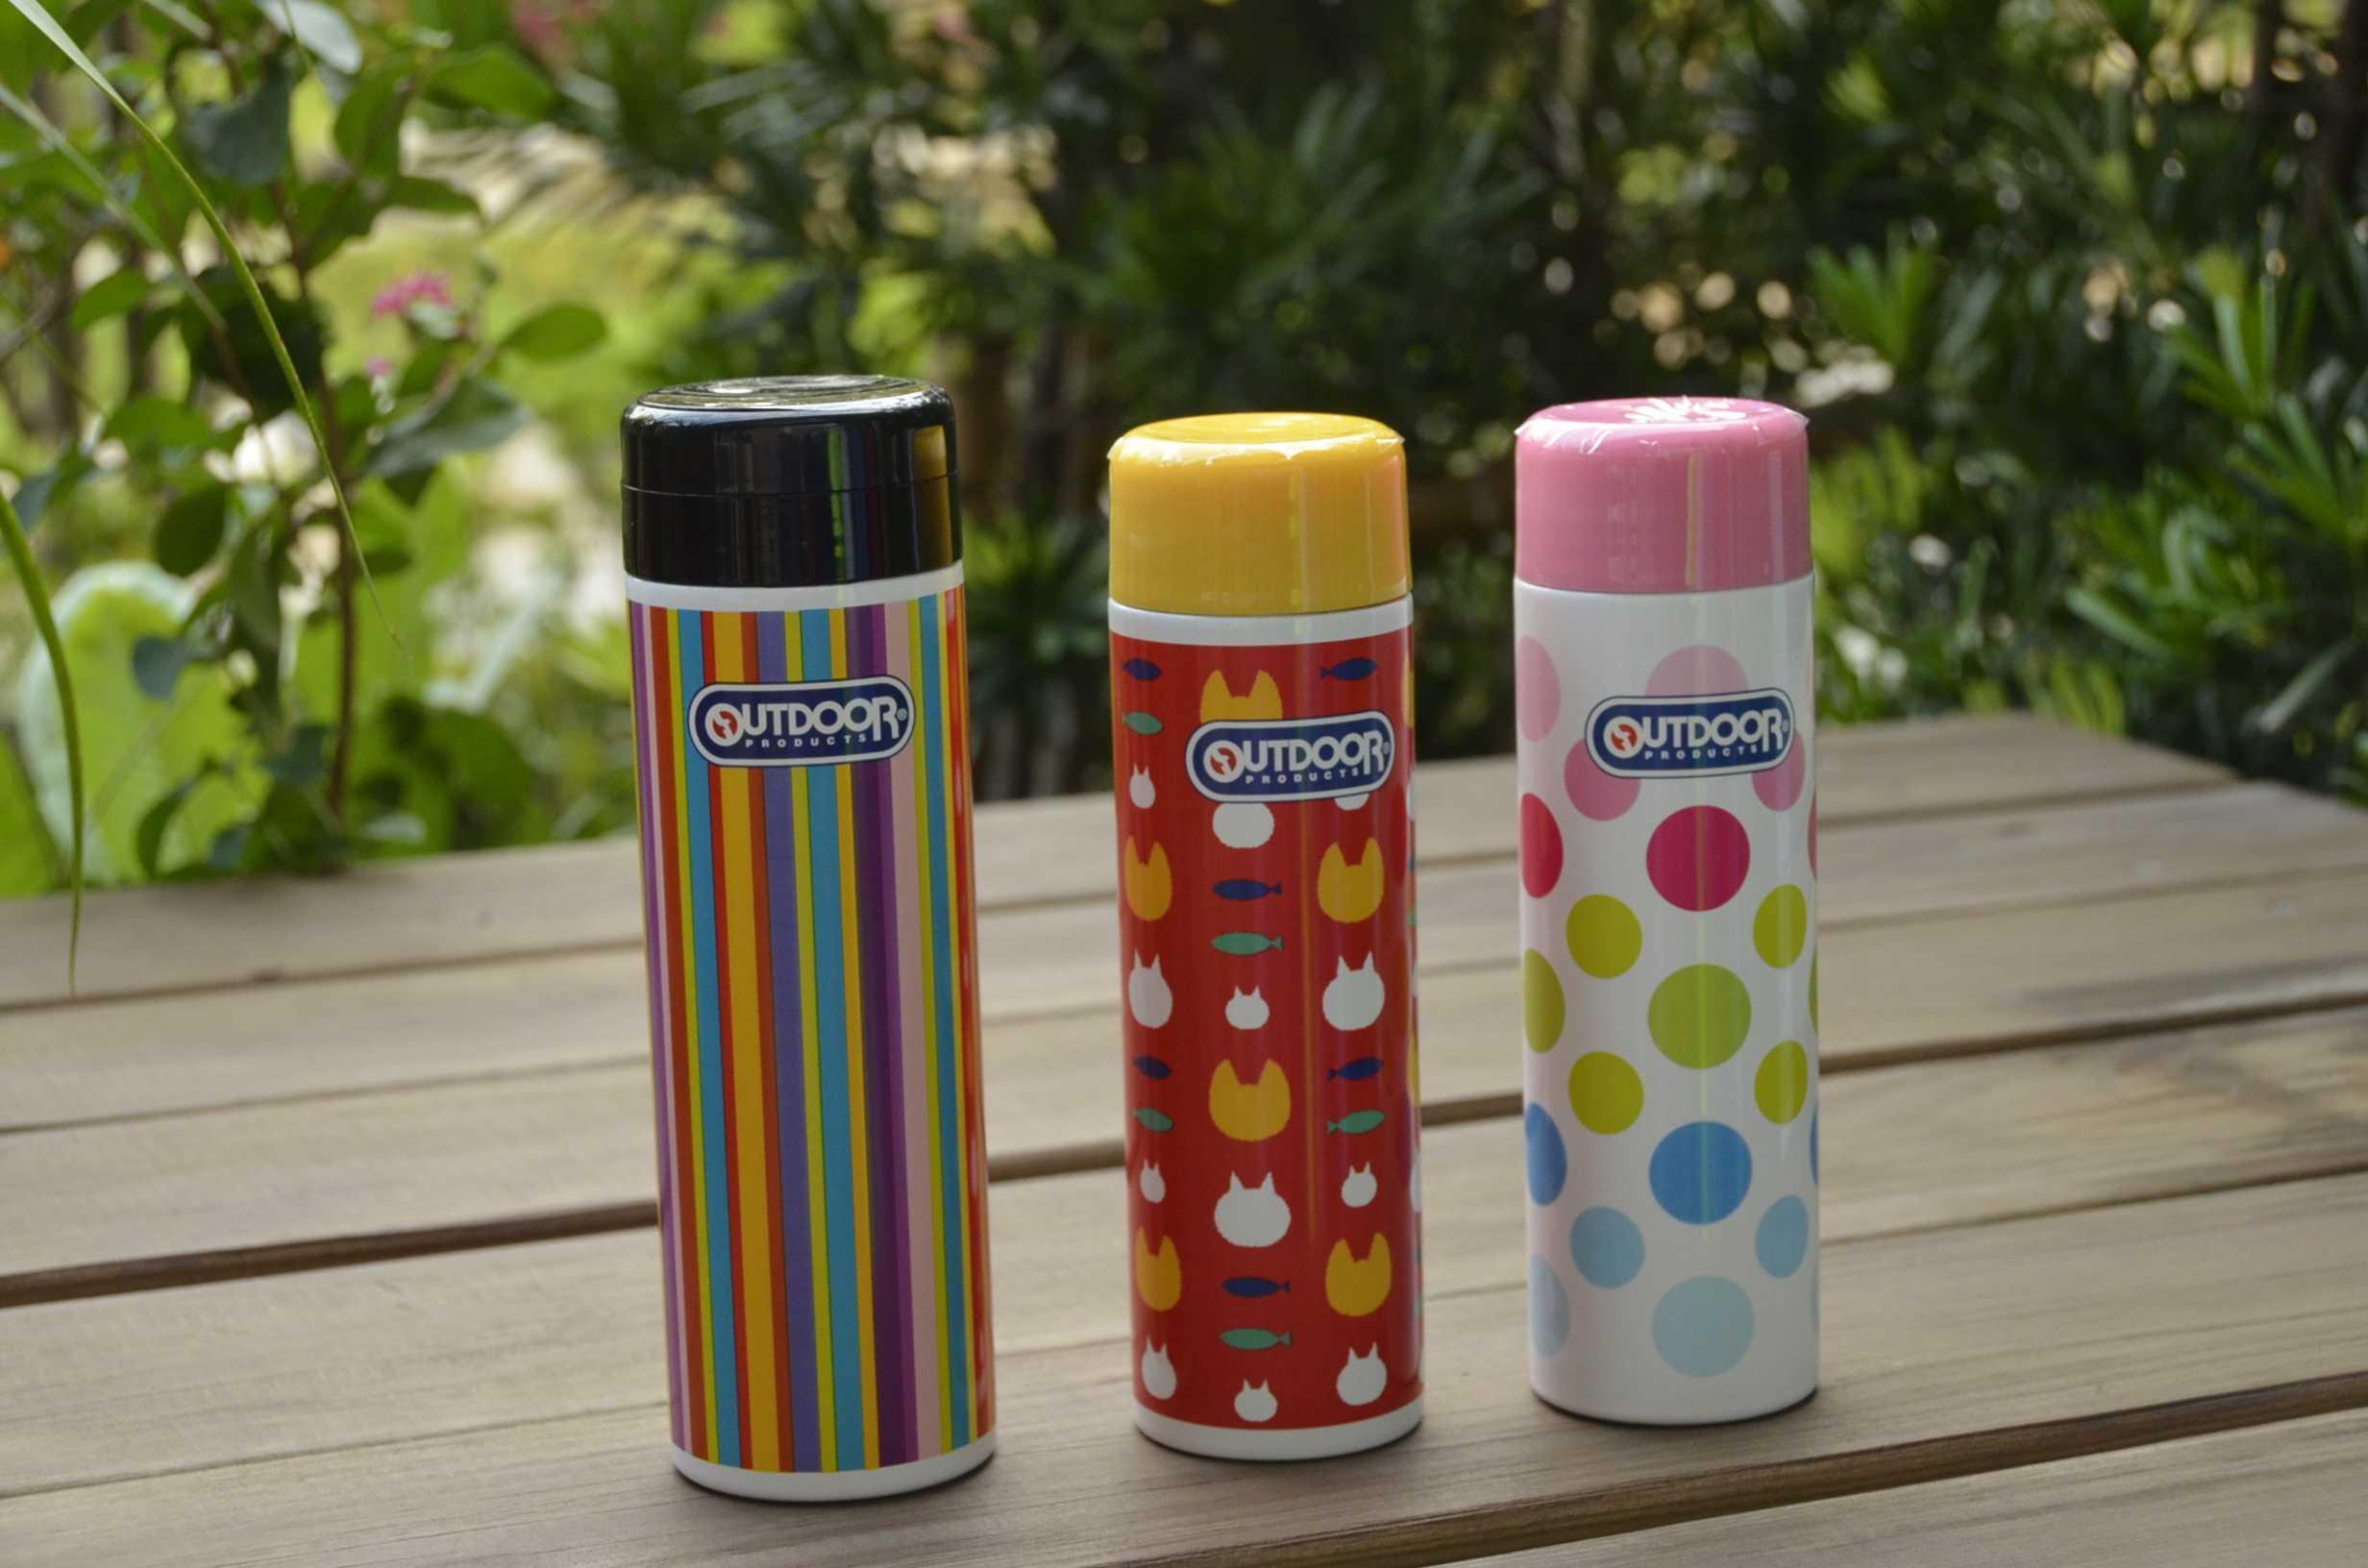 【菲比朵朵】 日本潮牌 Outdoor 保溫瓶(正品)